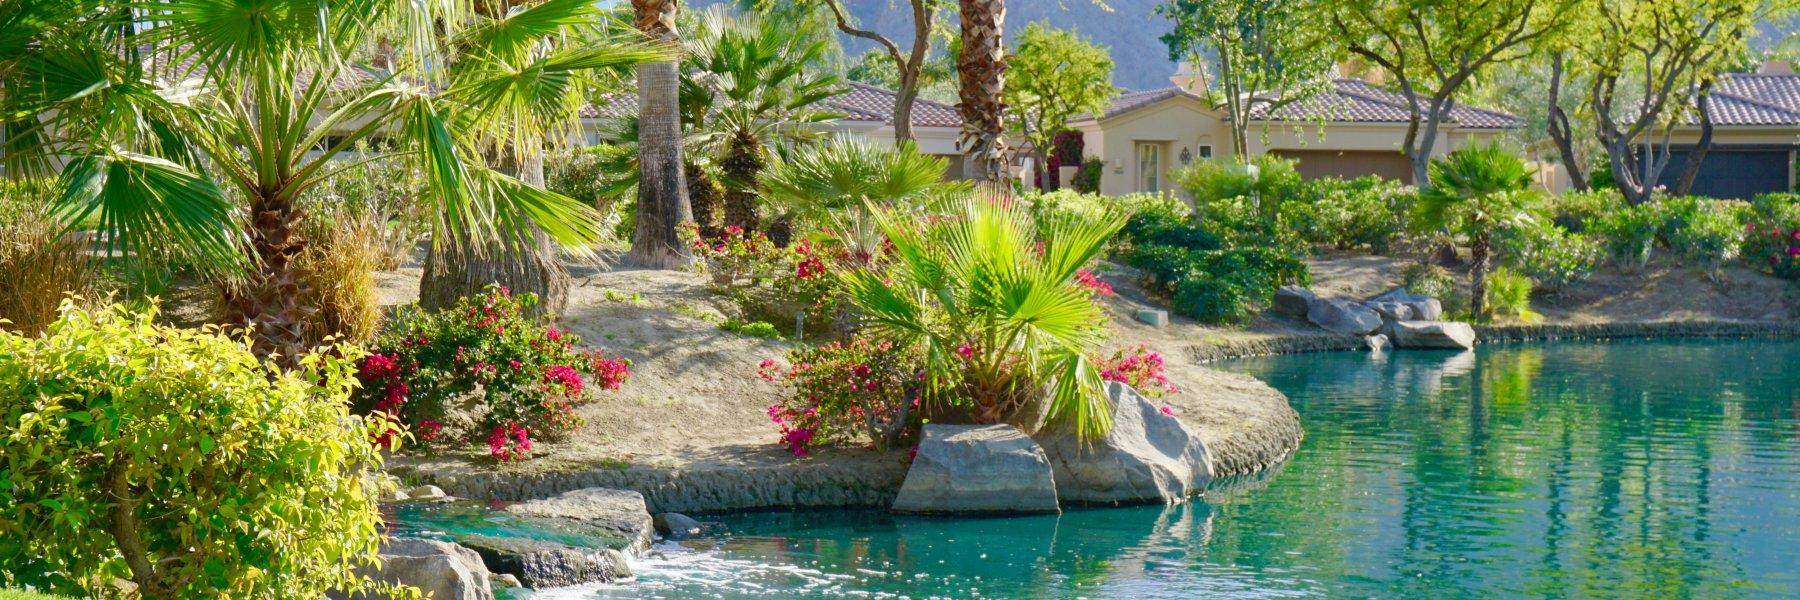 The Citrus is a community of homes in La Quinta California